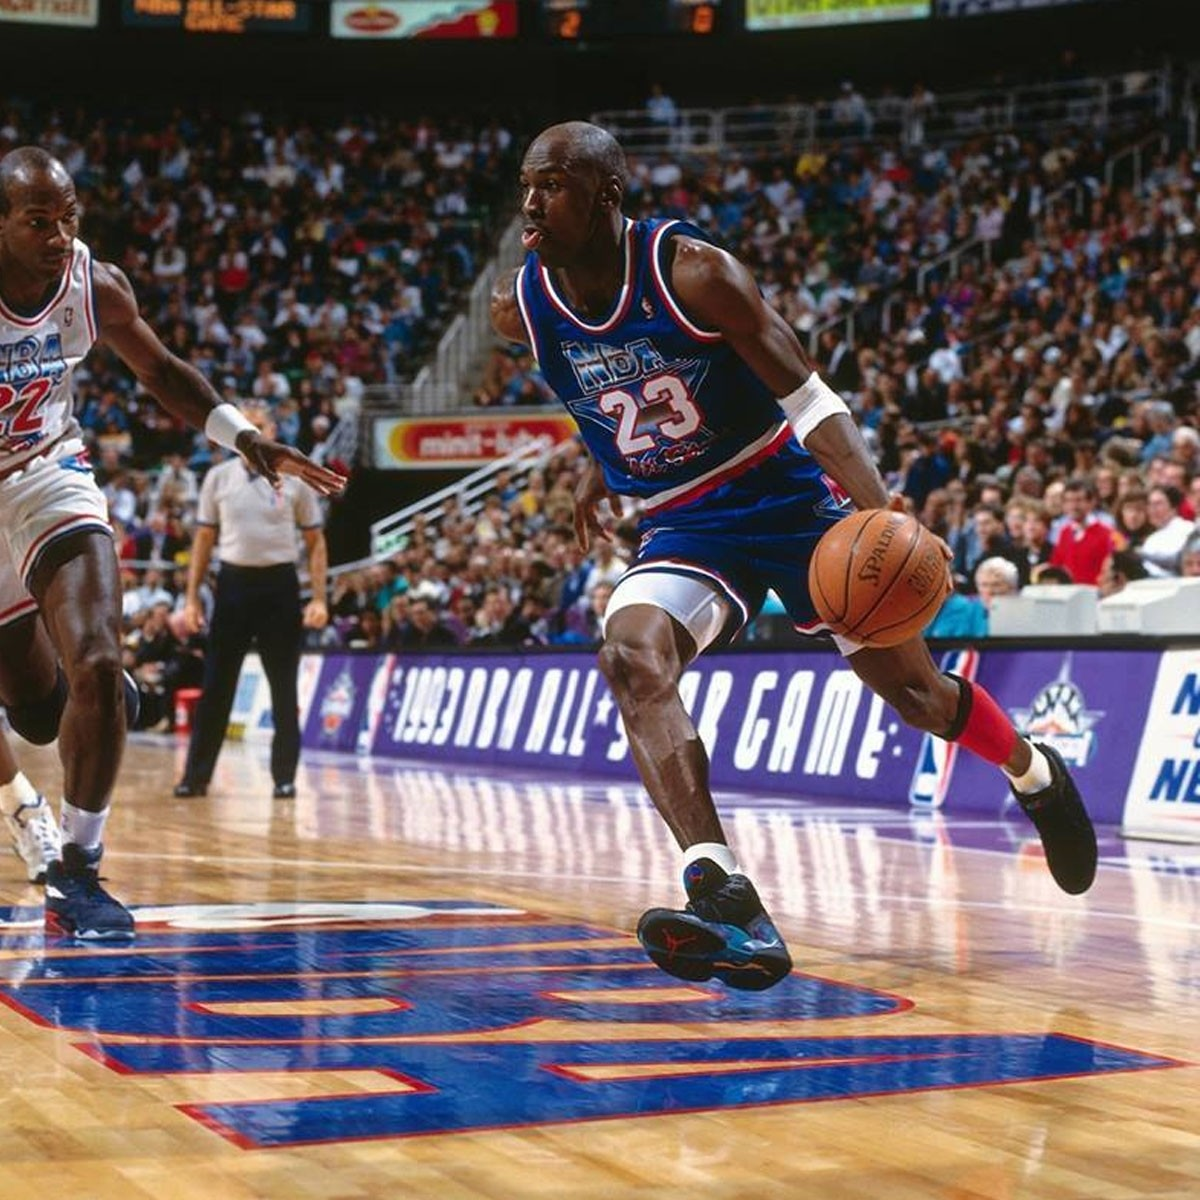 Mitchell & Ness Jordan Authentic Jersey 'All-Star 93' ASEROYA9-3MJO